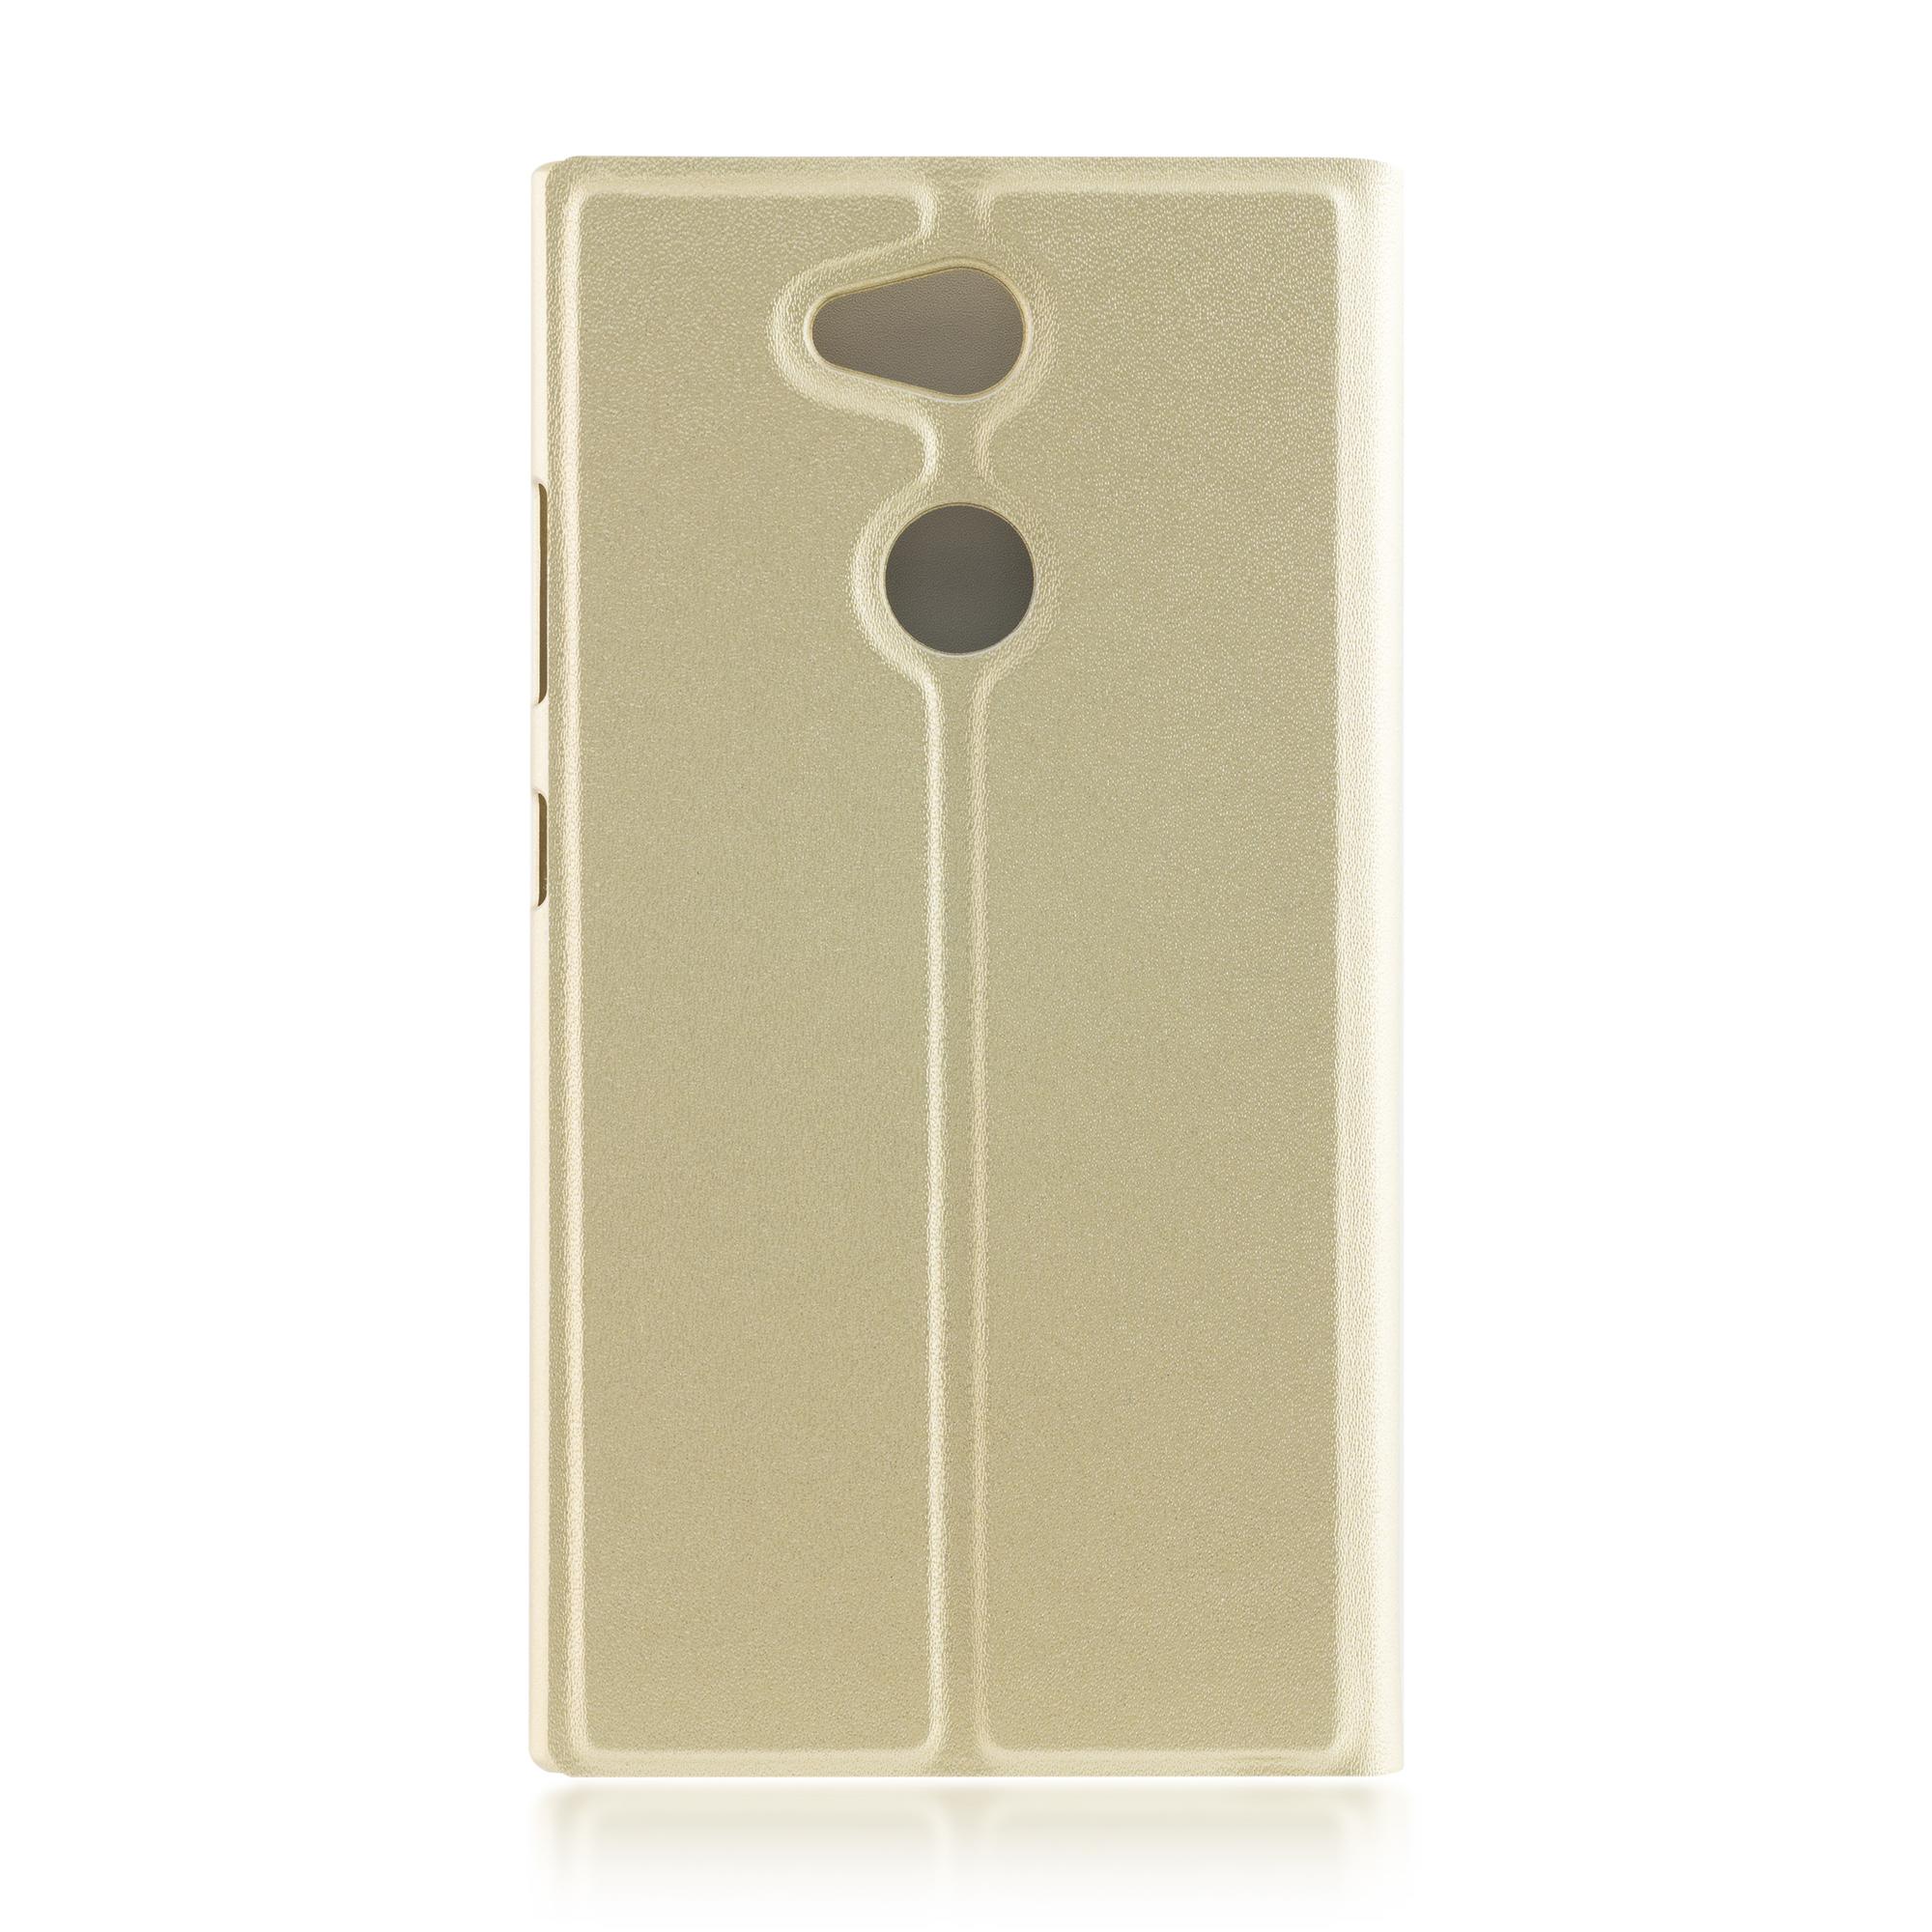 Чехол золотого цвета для Xperia L2 купить в Sony Centre Воронеж